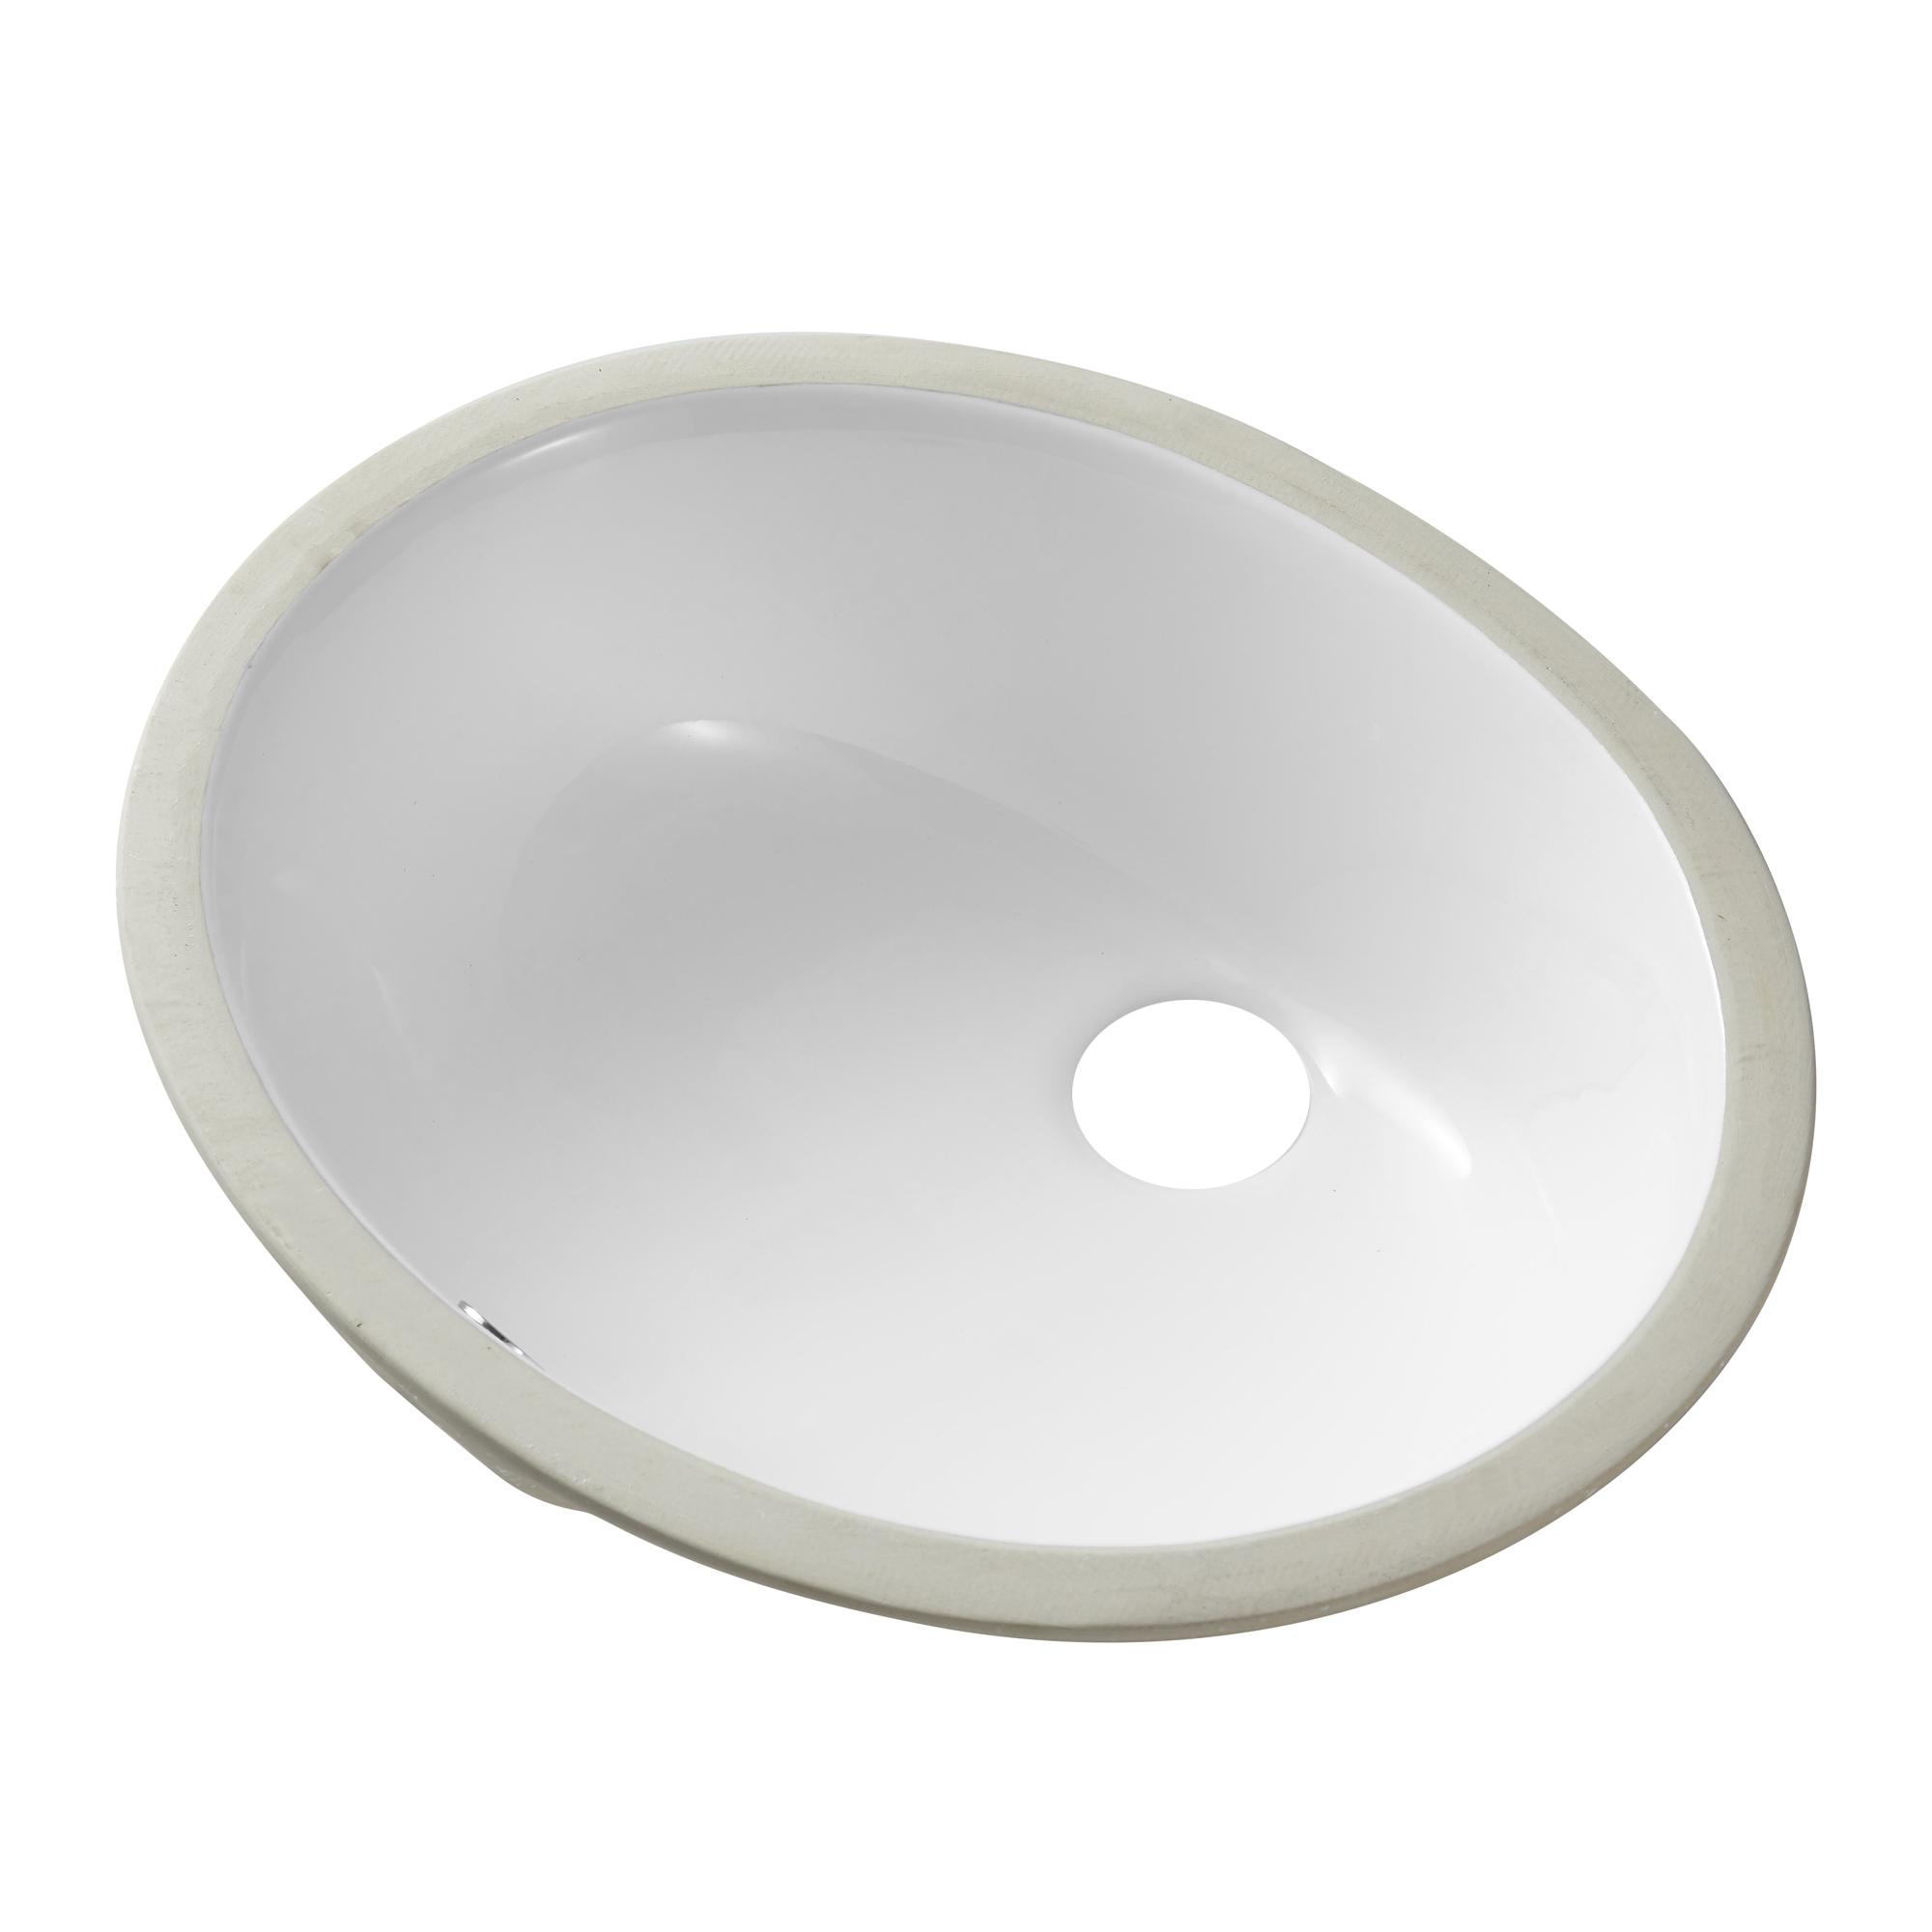 [US Direct] Ceramic Oval Undermount White Bathroom Sink Art Basin